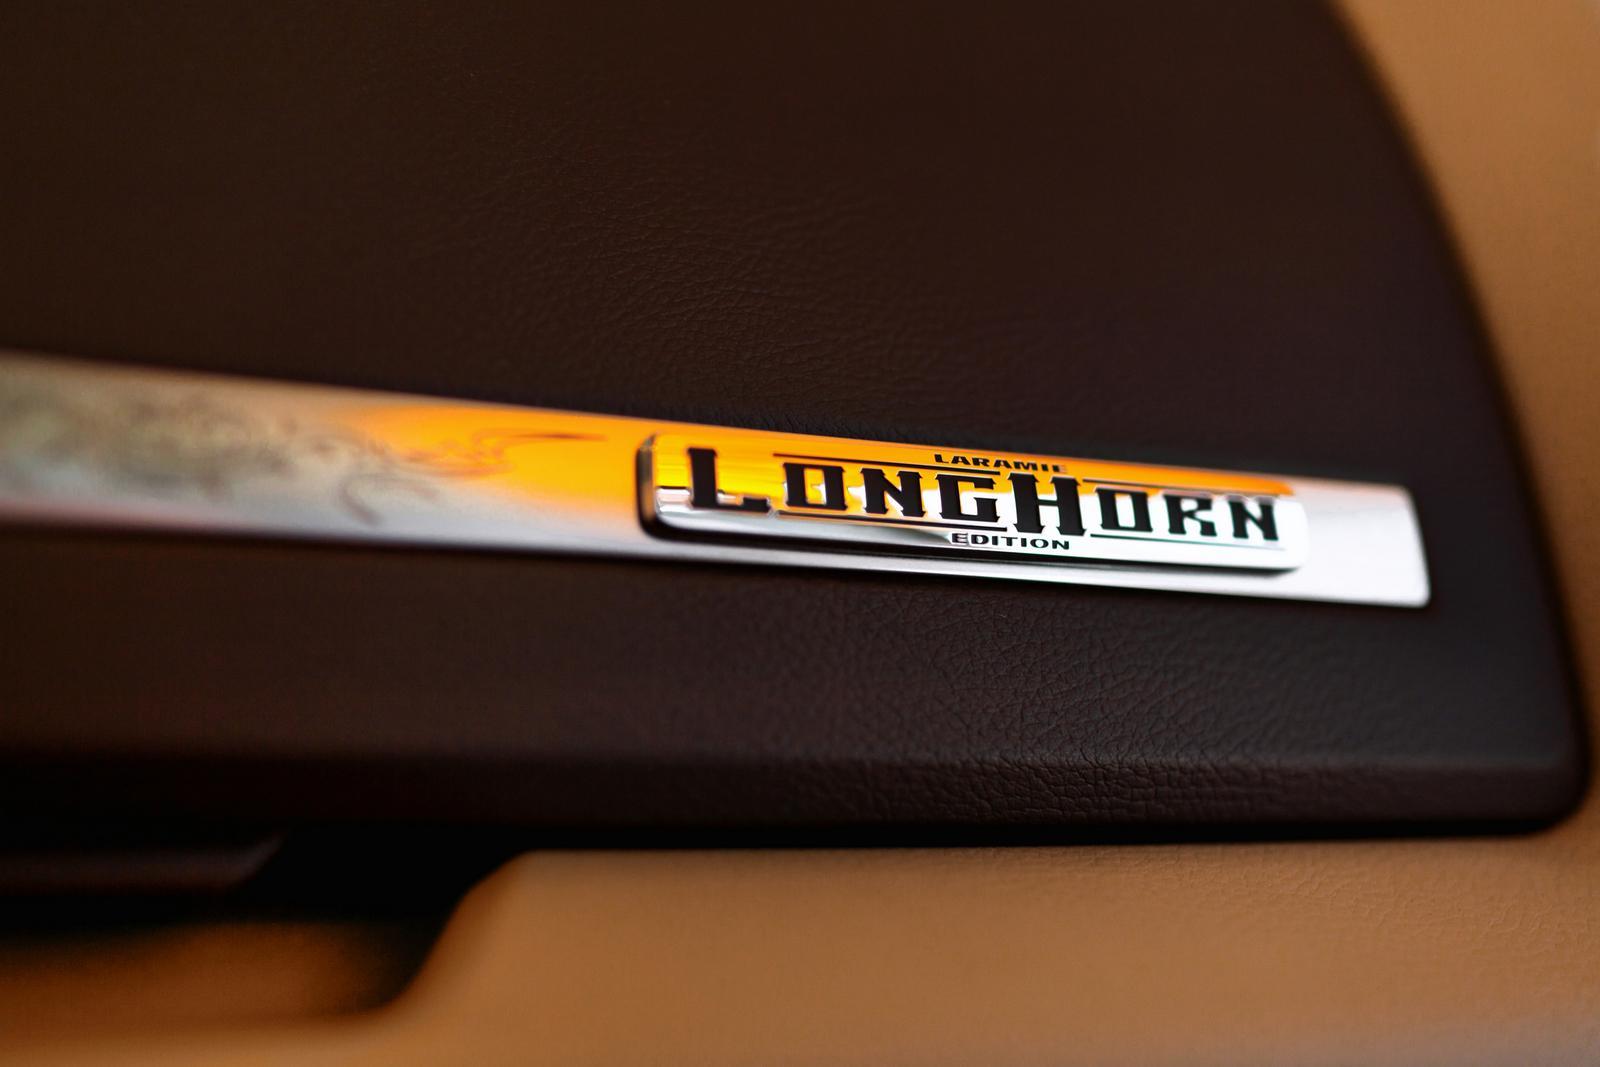 2011 dodge ram laramie longhorn edition 12 17 dodge back to picture